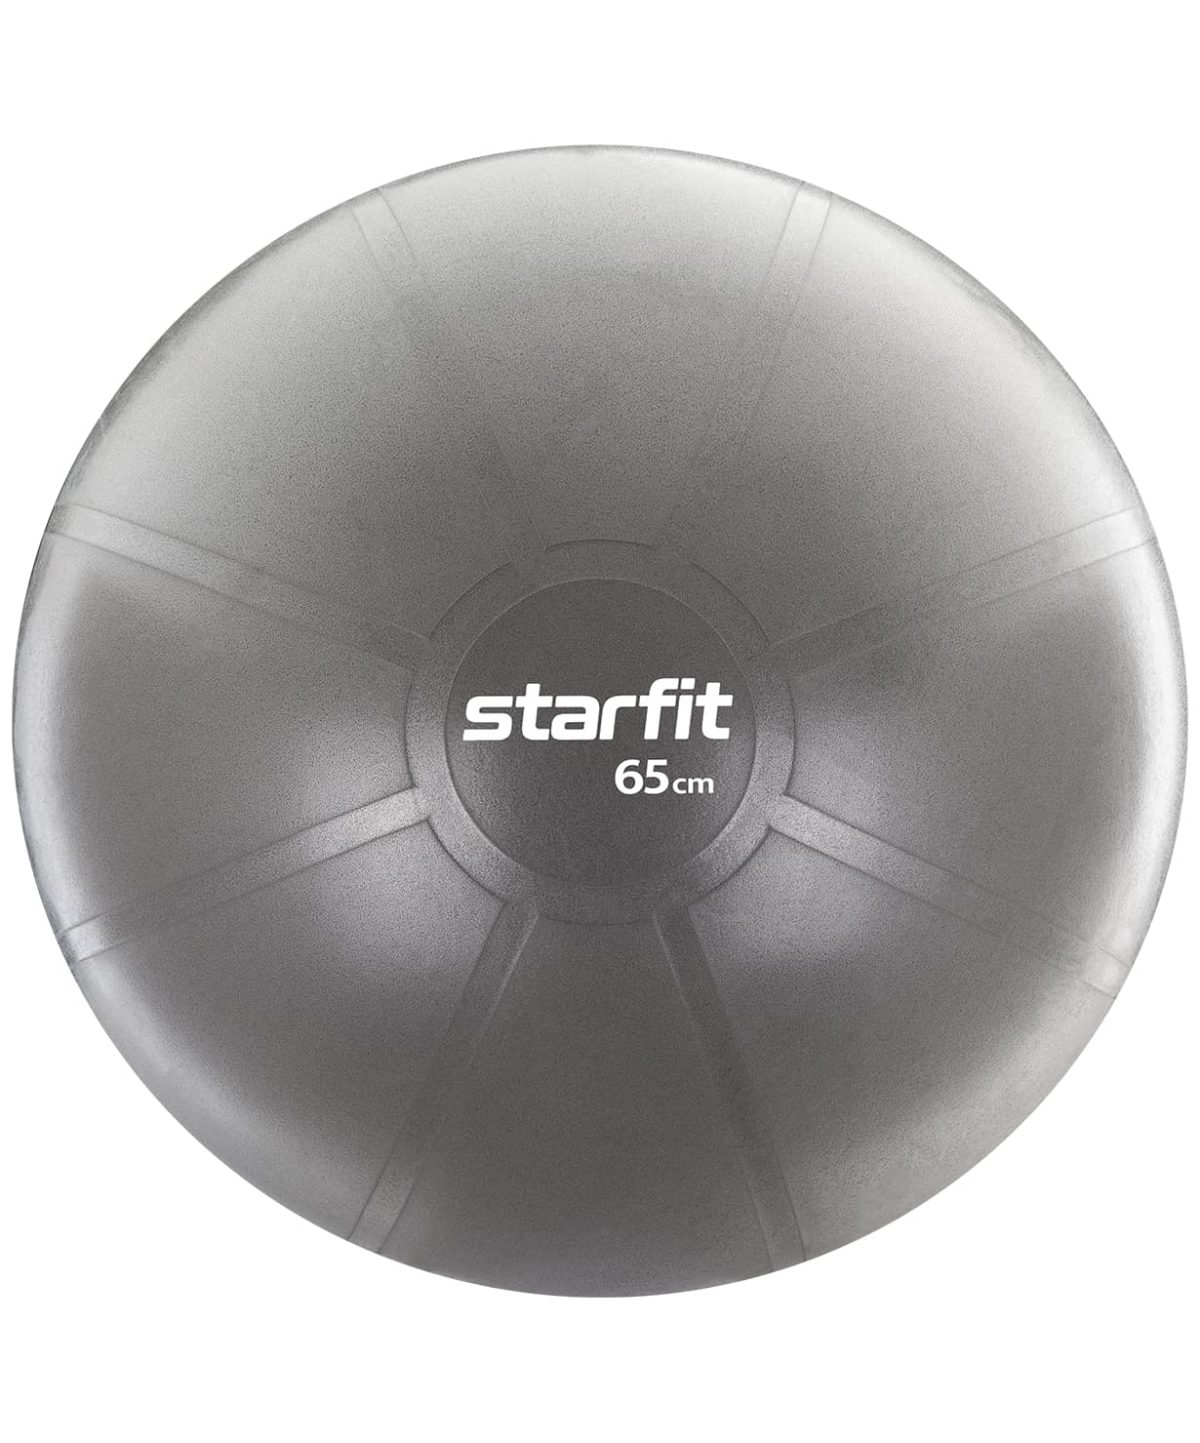 STARFIT PRO Фитбол антивзрыв 65см. 1200гр. без насоса GB-107 - 1